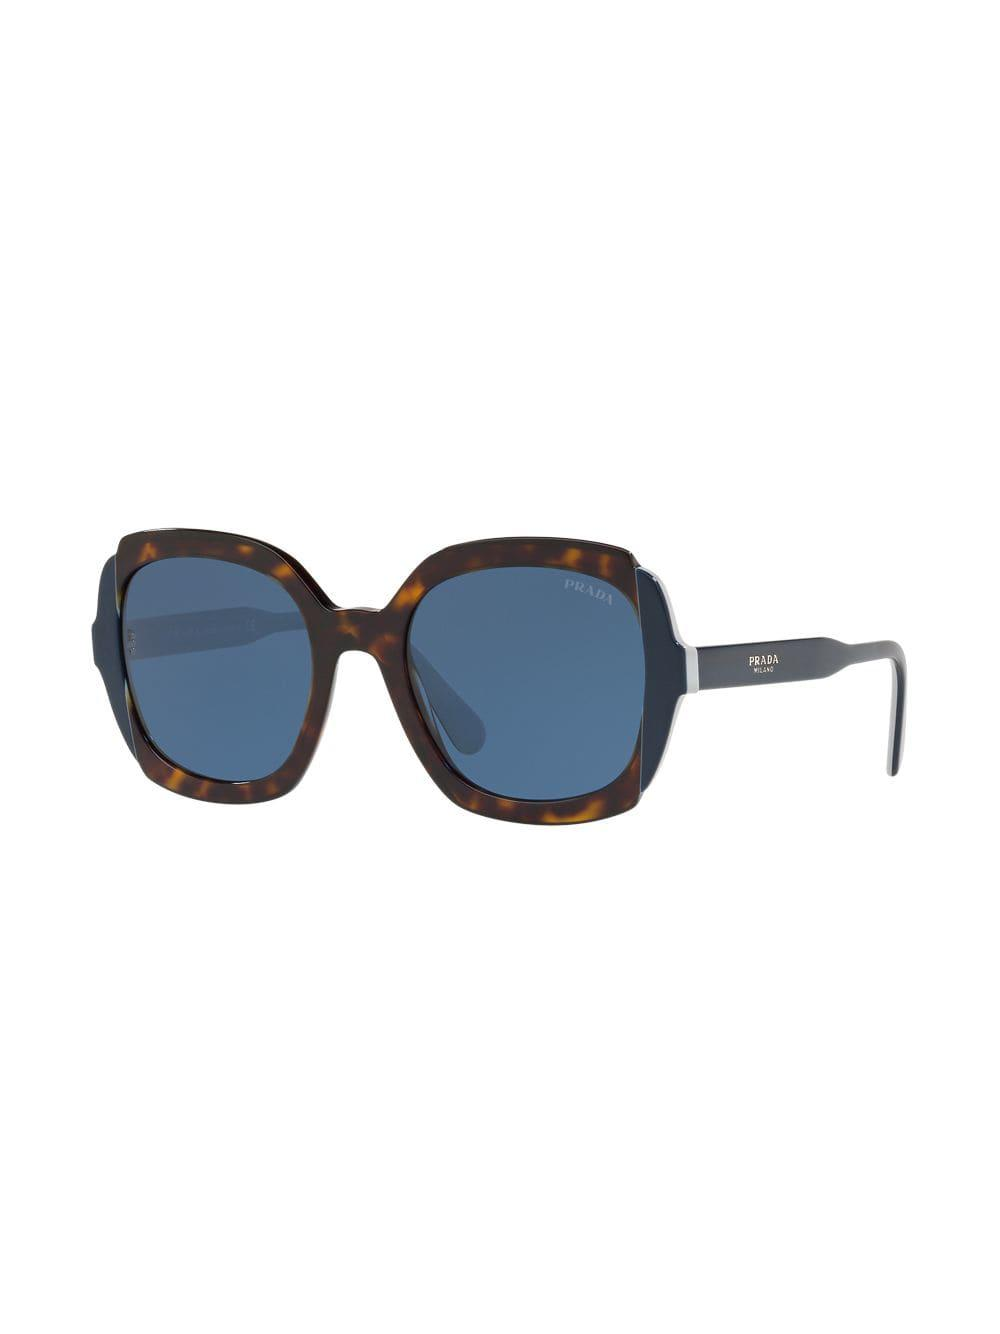 036b688f749c Prada - Brown Oversized Shaped Sunglasses - Lyst. View fullscreen